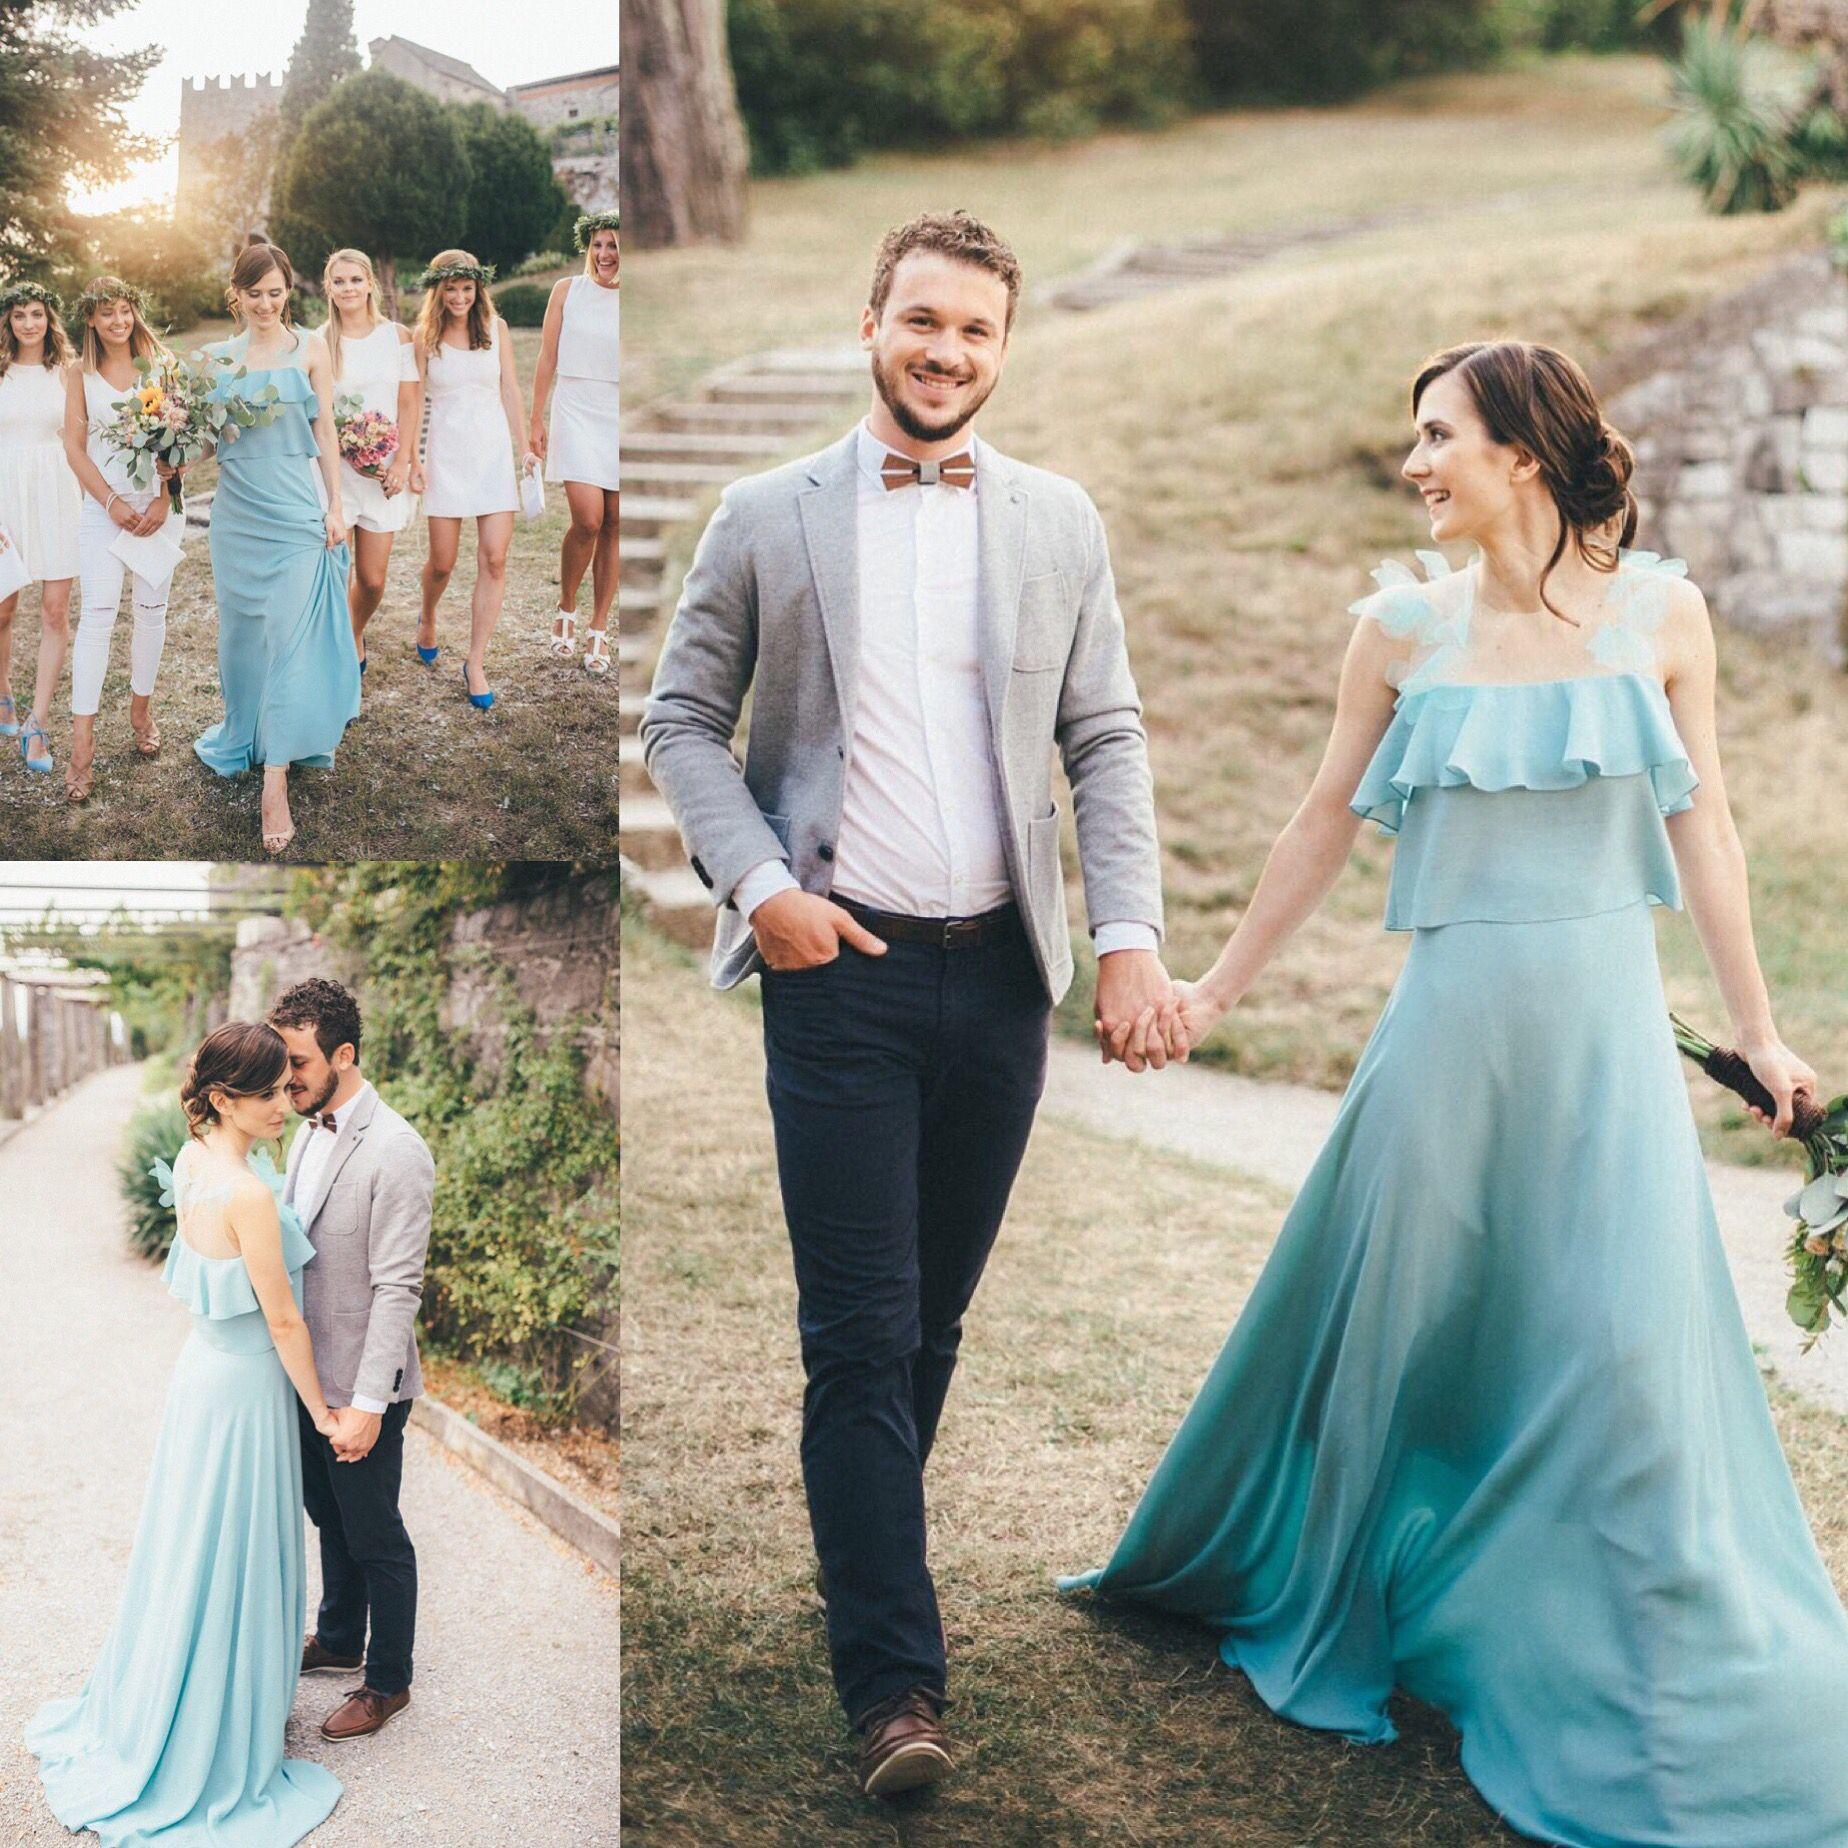 Wedding In Style Dress Ymocion Design Location Grad Stanjel Photo Neža